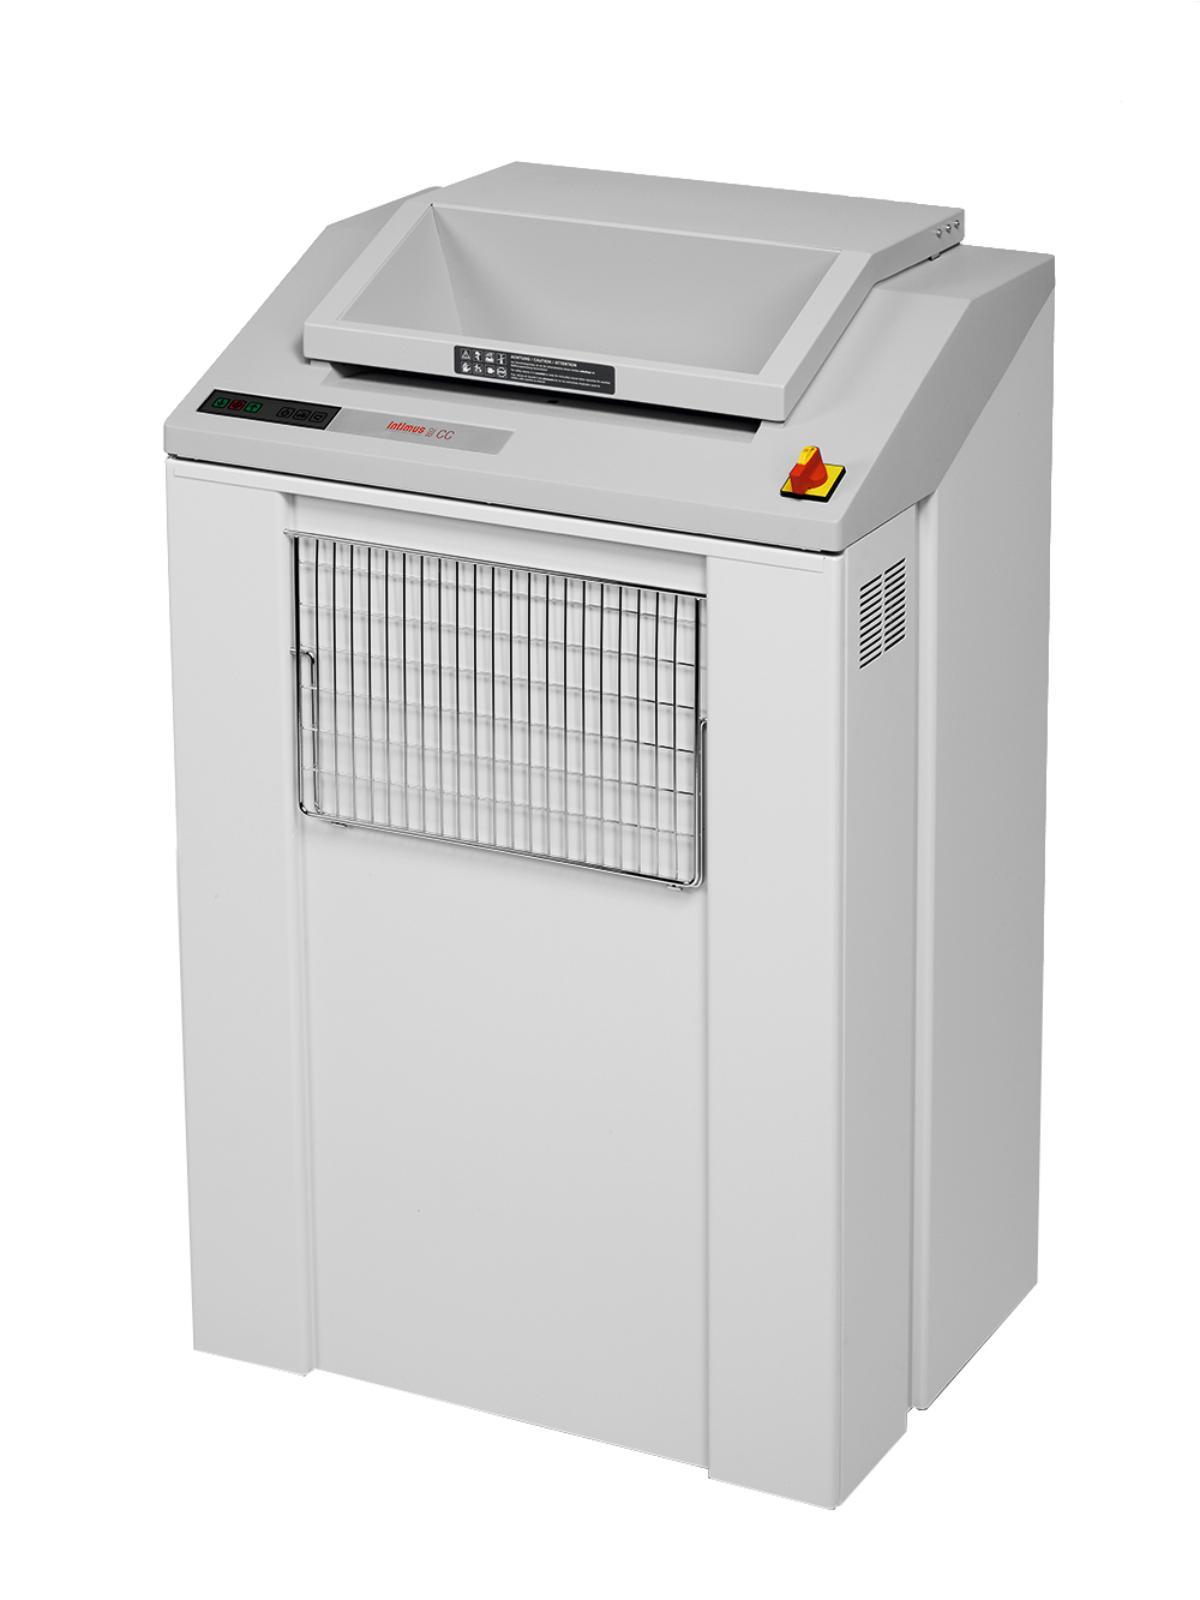 Intimus 802 CC - Makuleringsmaskiner - Kontor høyvolum